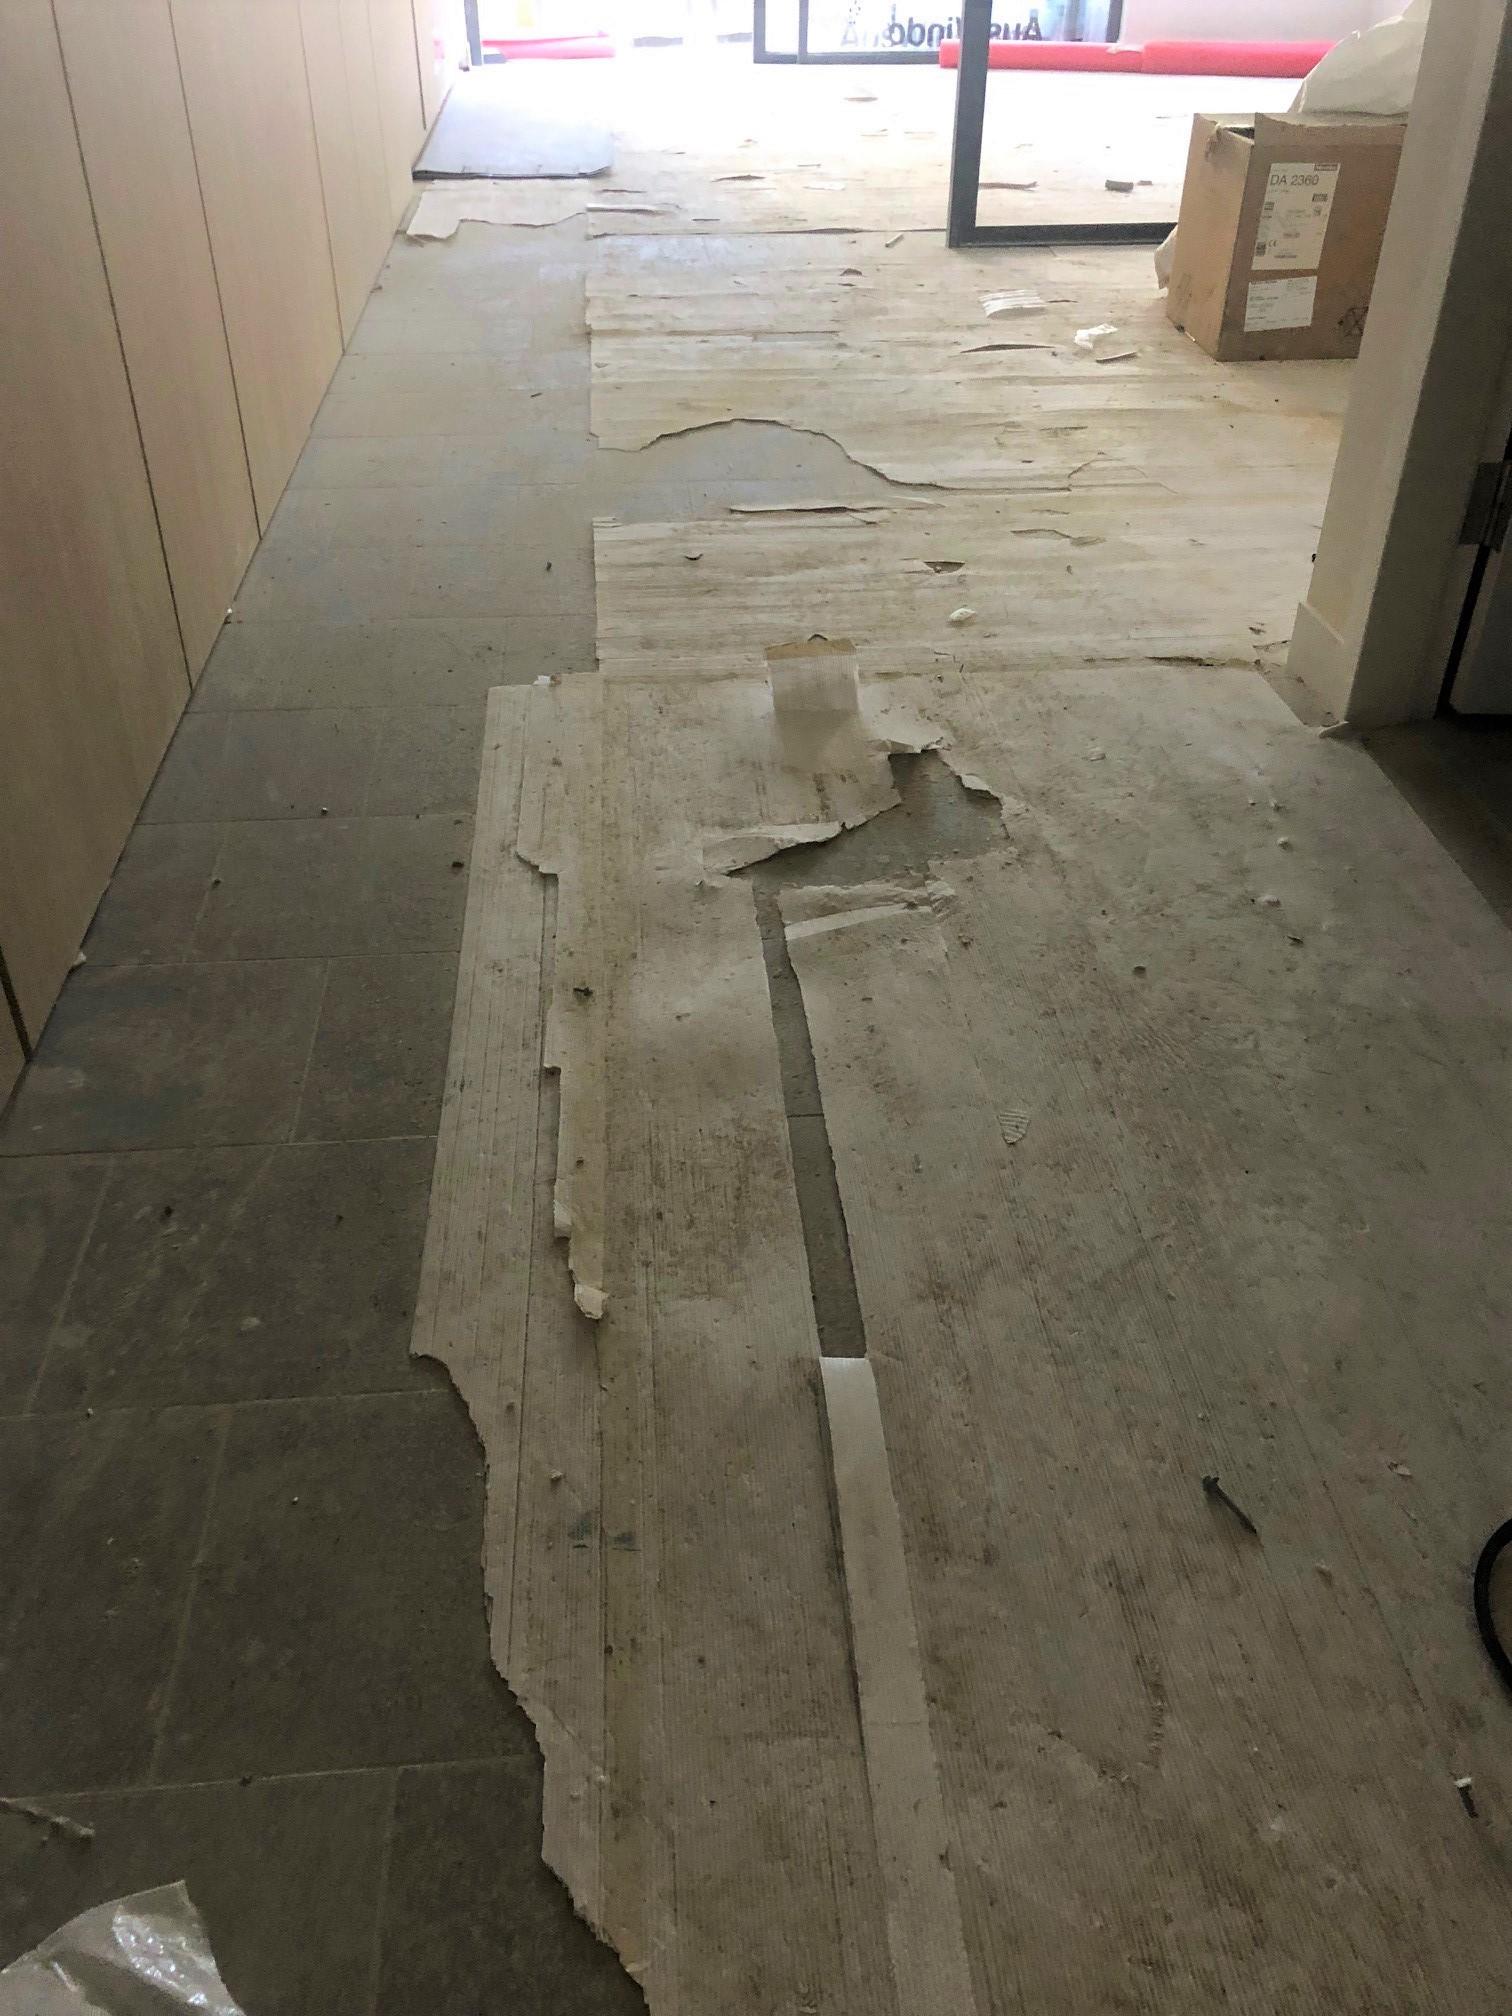 Honcho Supplies - Rob's Blog2. Image showing damaged cheap corflute, basically providing no surface protection